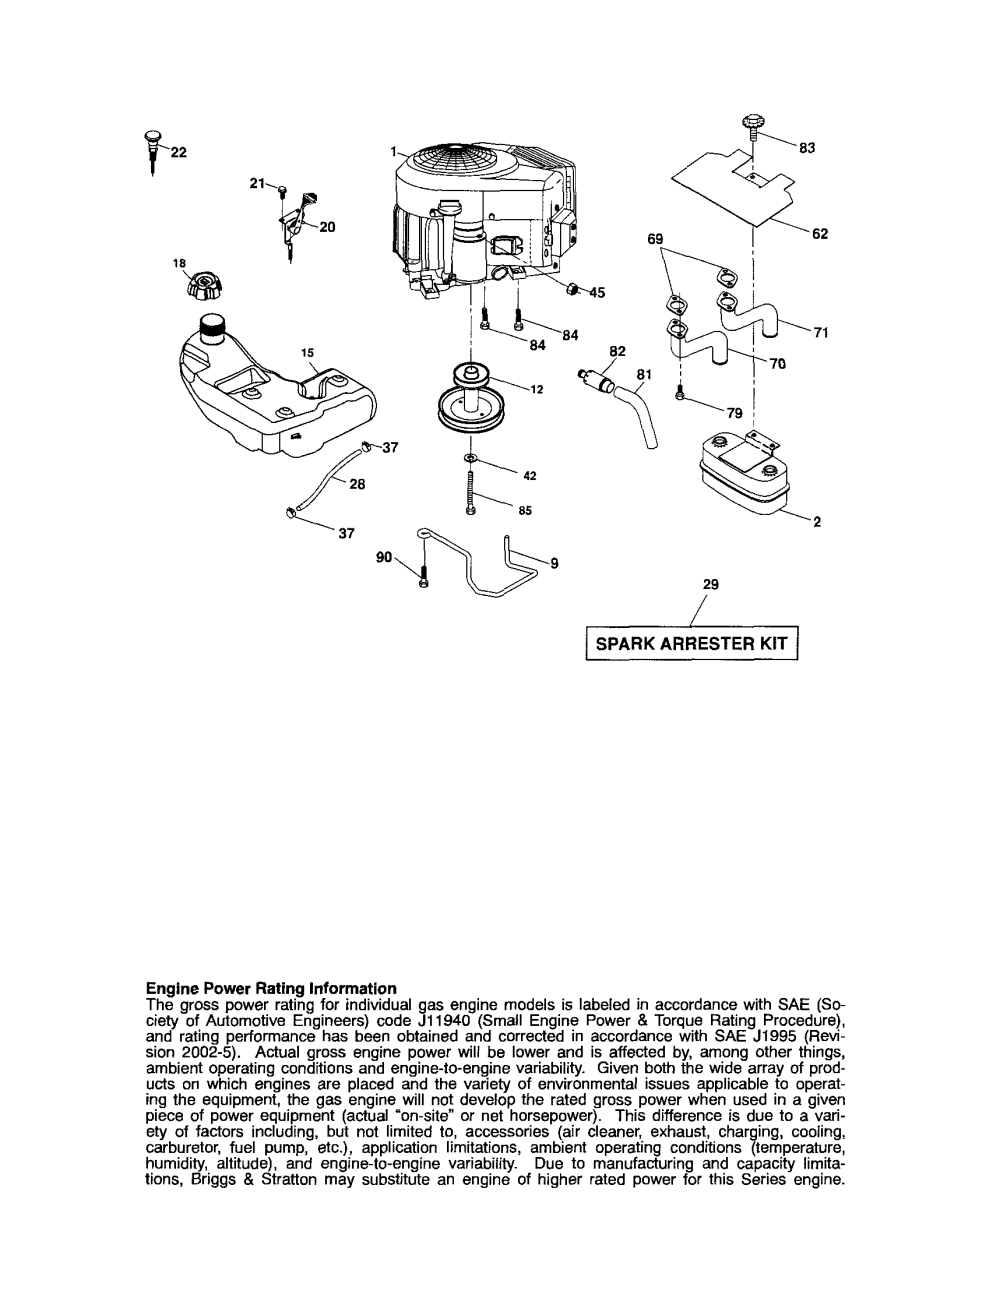 medium resolution of wiring diagram craftsman model 917 275671 basic electronics wiringwiring diagram craftsman model 917 273820 wiring librarywiring